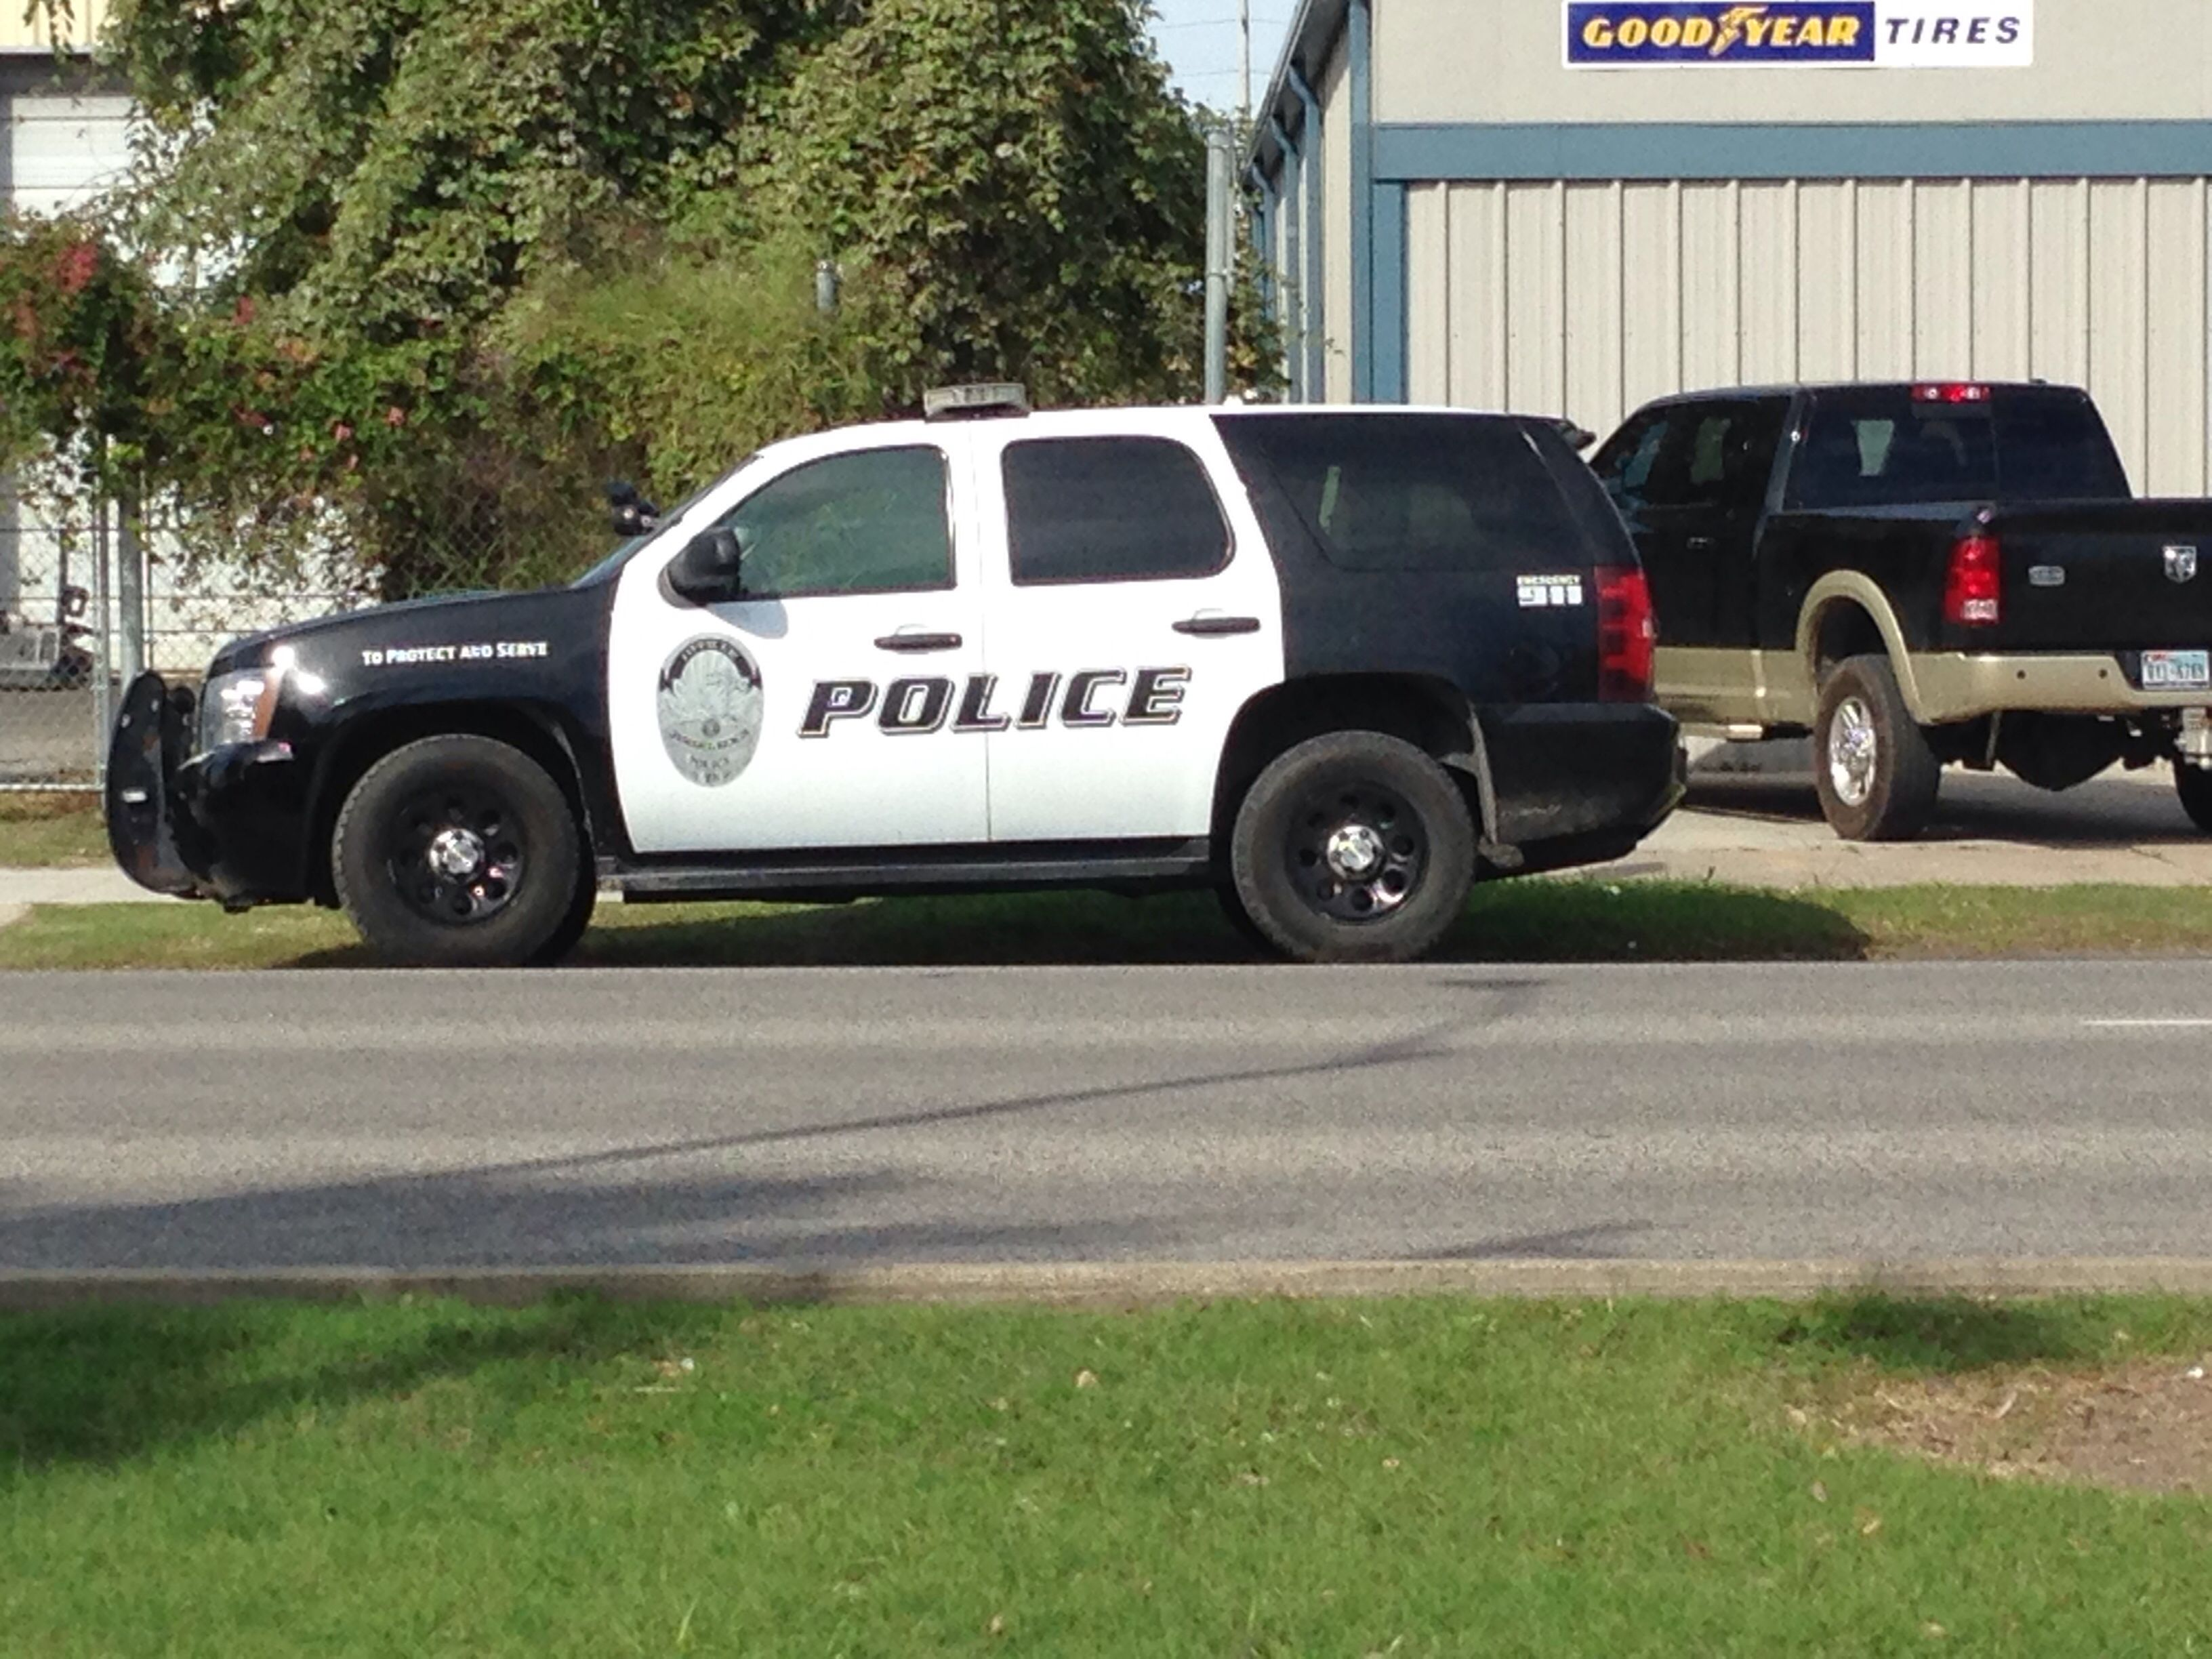 Jamaica Beach Police Department Chevy Tahoe Texas Police Chevy Tahoe Police Cars